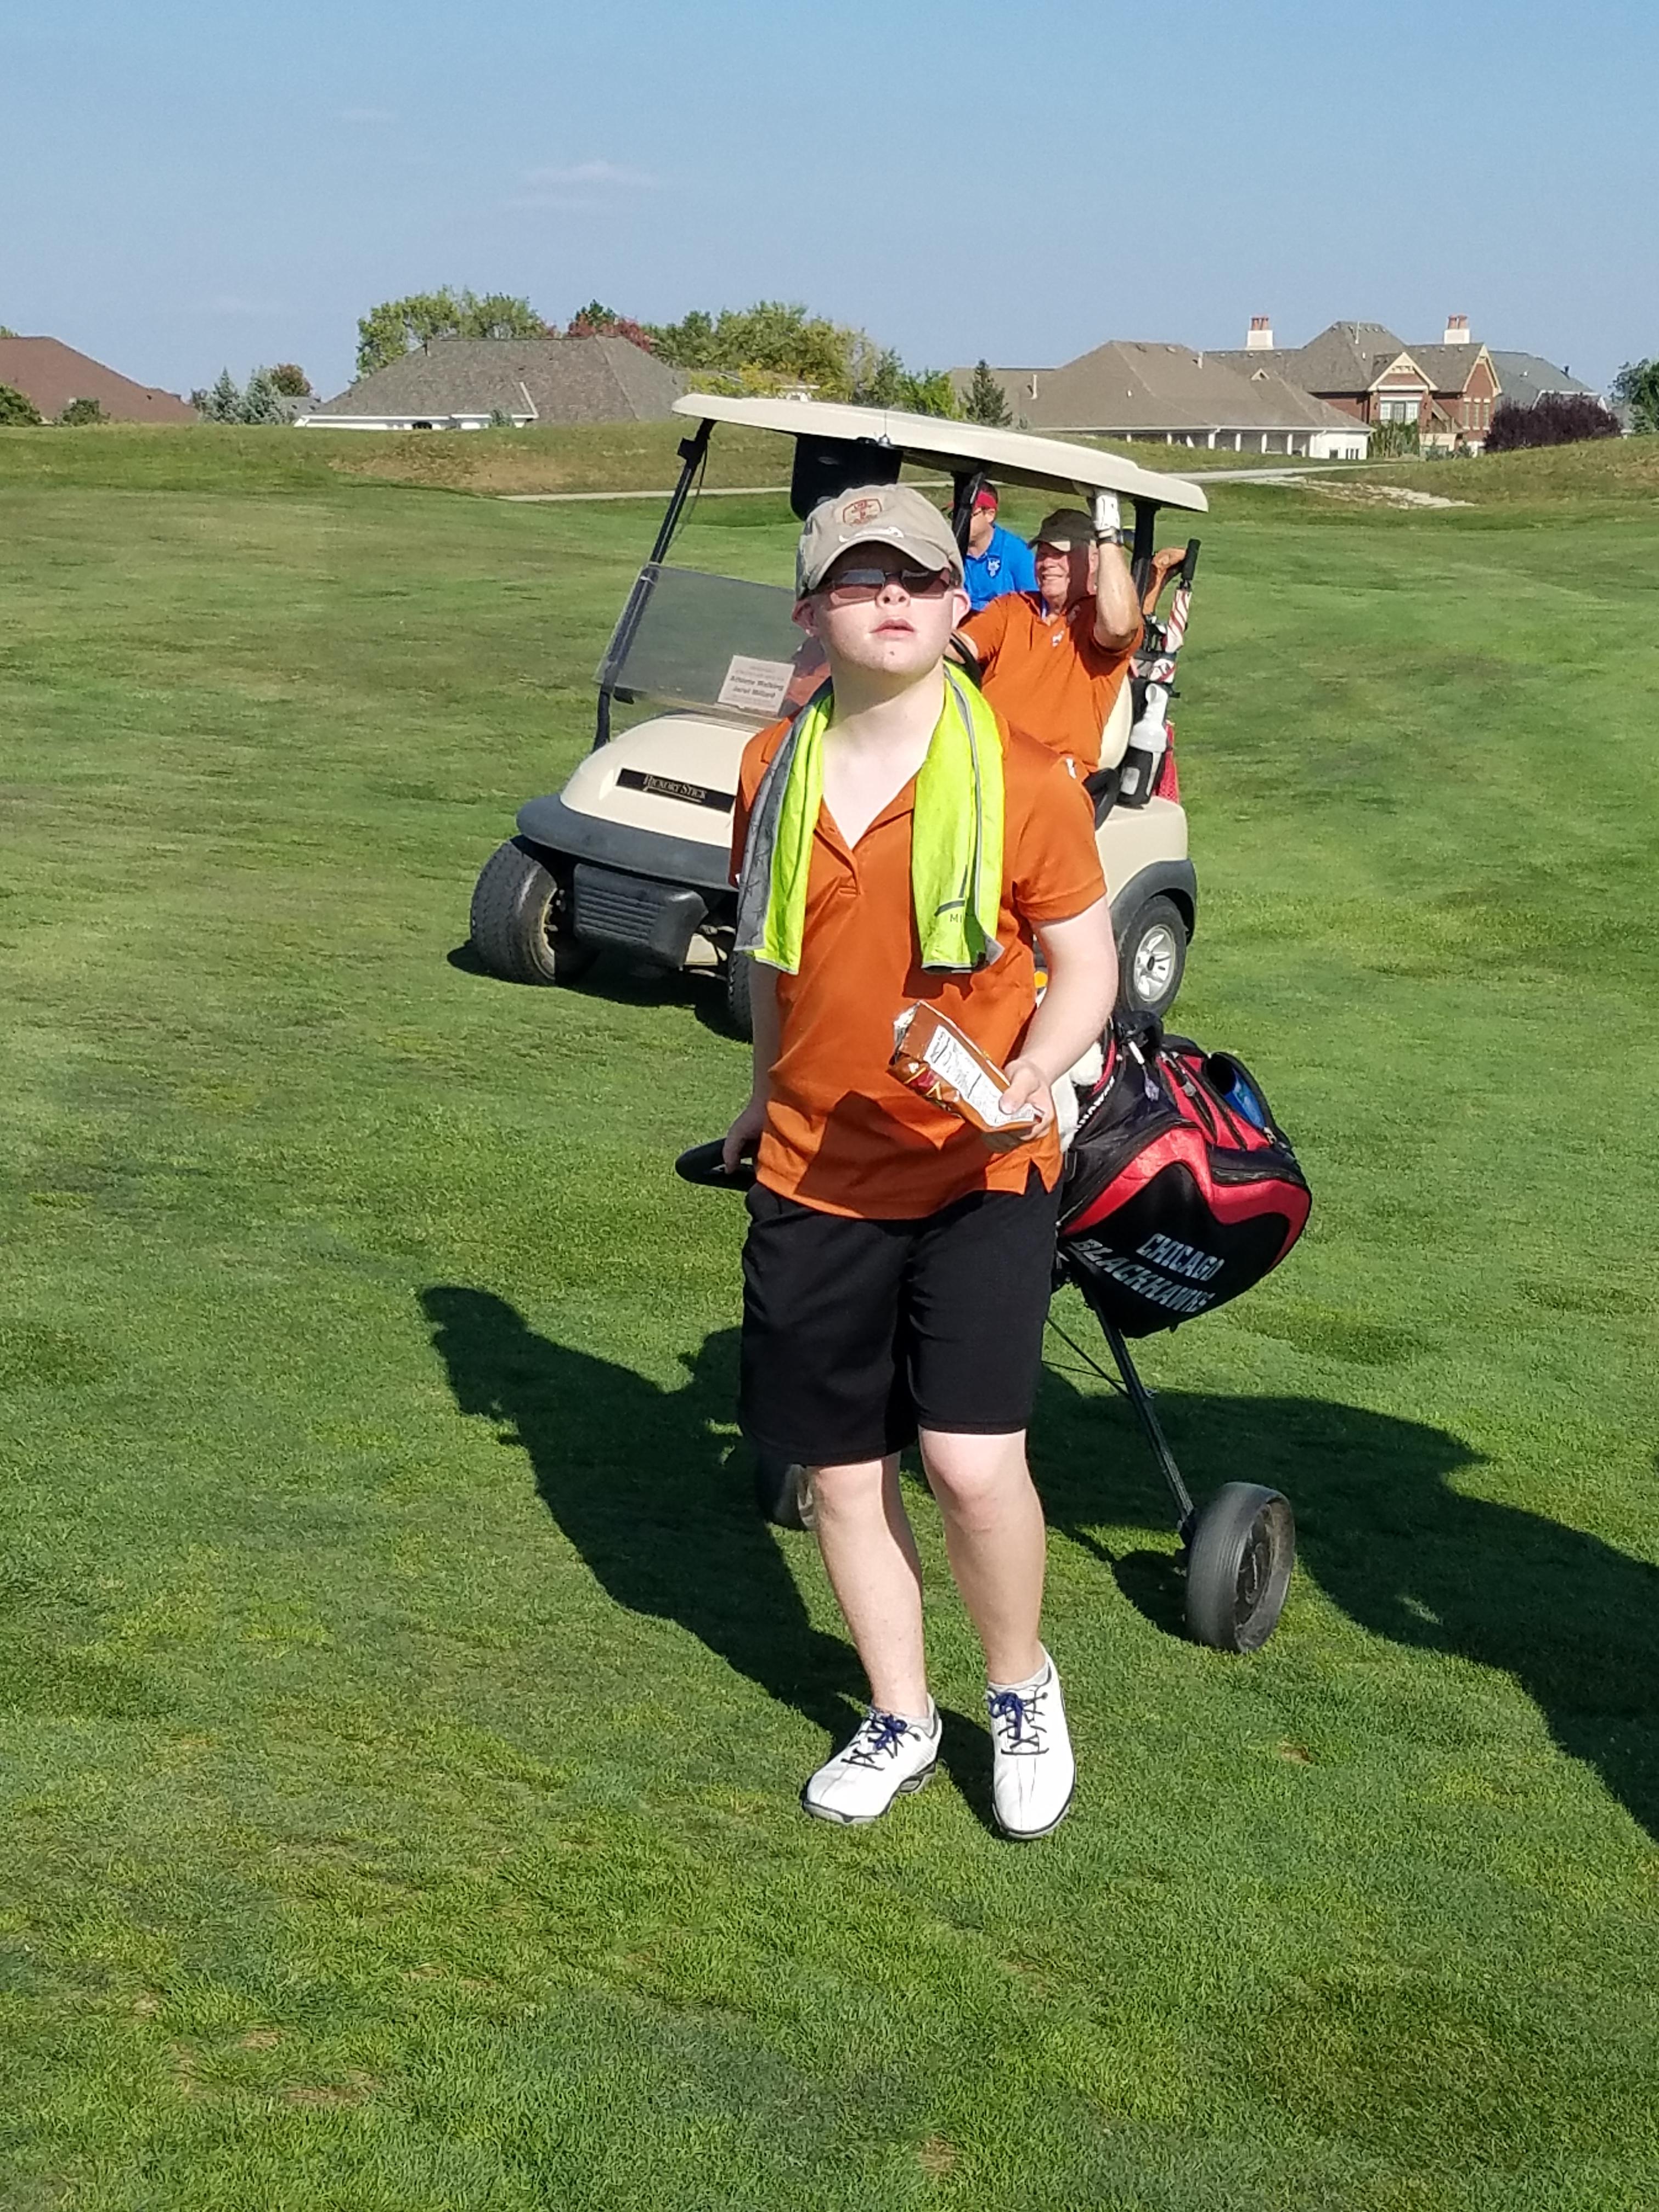 Zack Millard in front of his golf cart